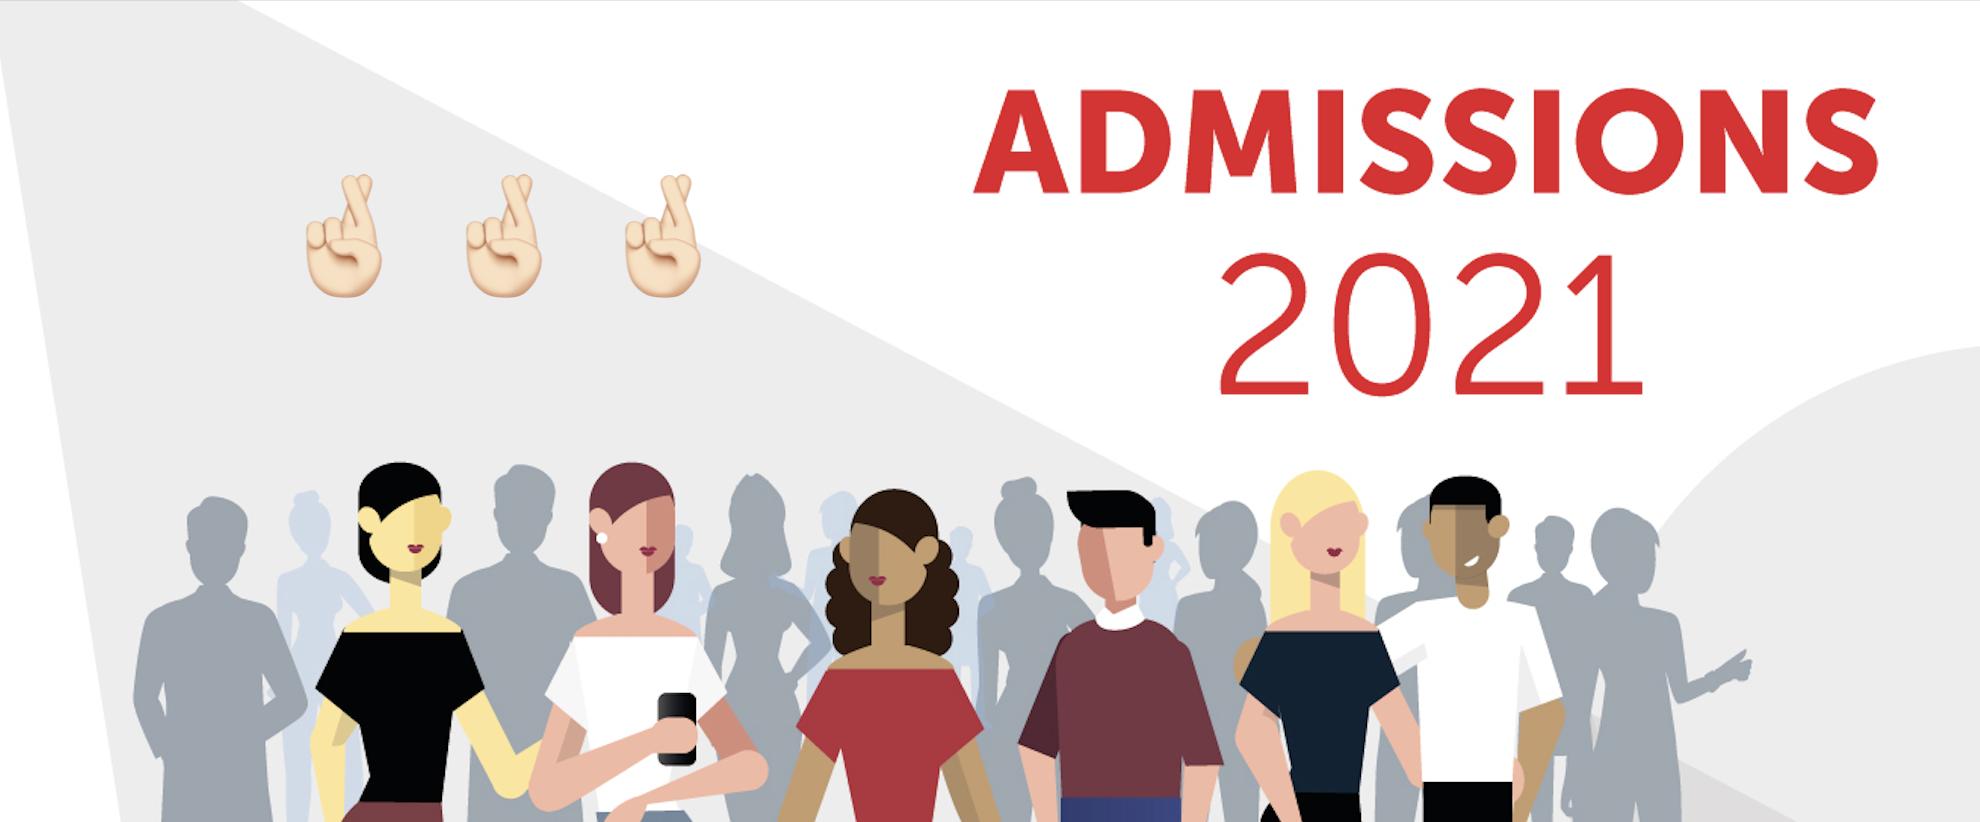 Admissions 2021